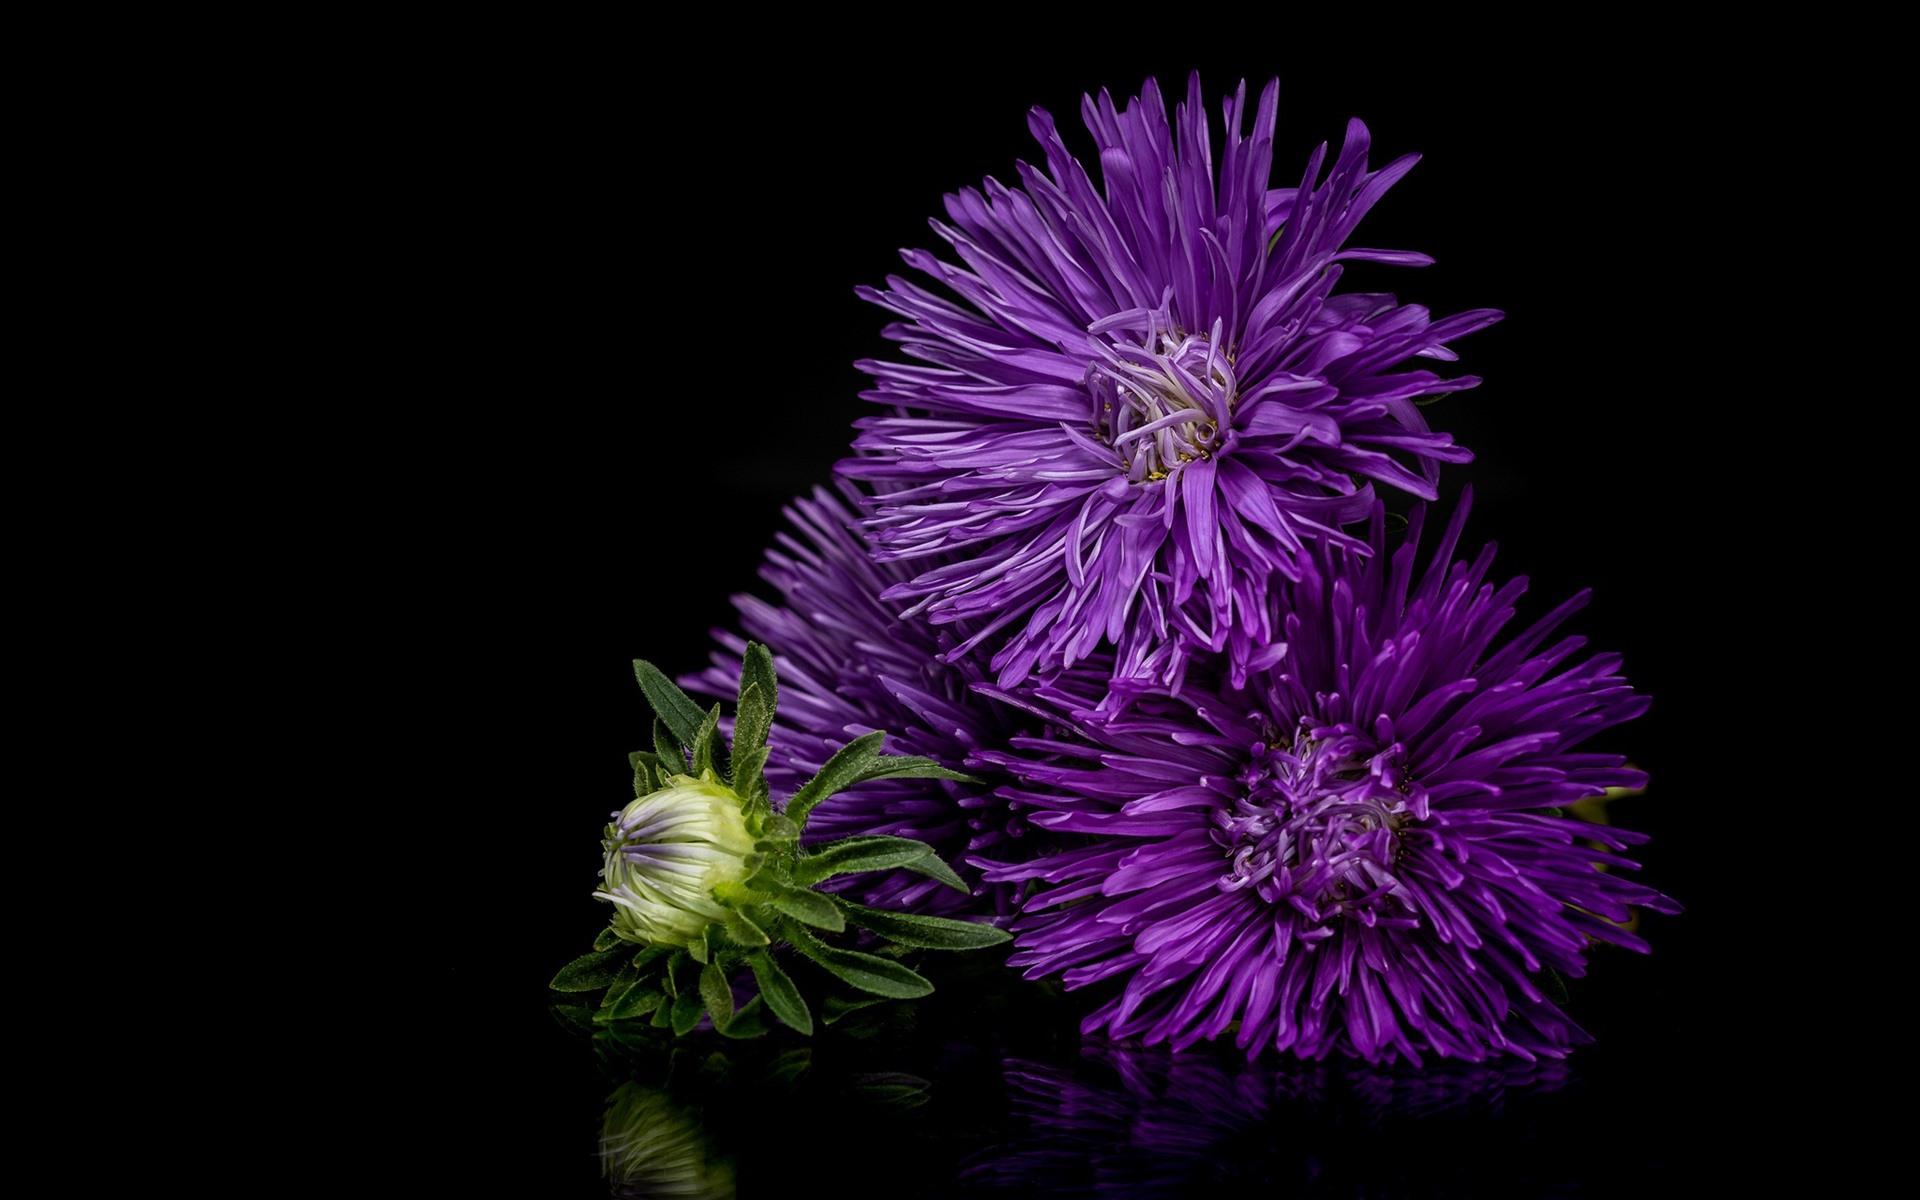 Wallpaper Purple Flowers Asters Black Background 1920x1200 Hd